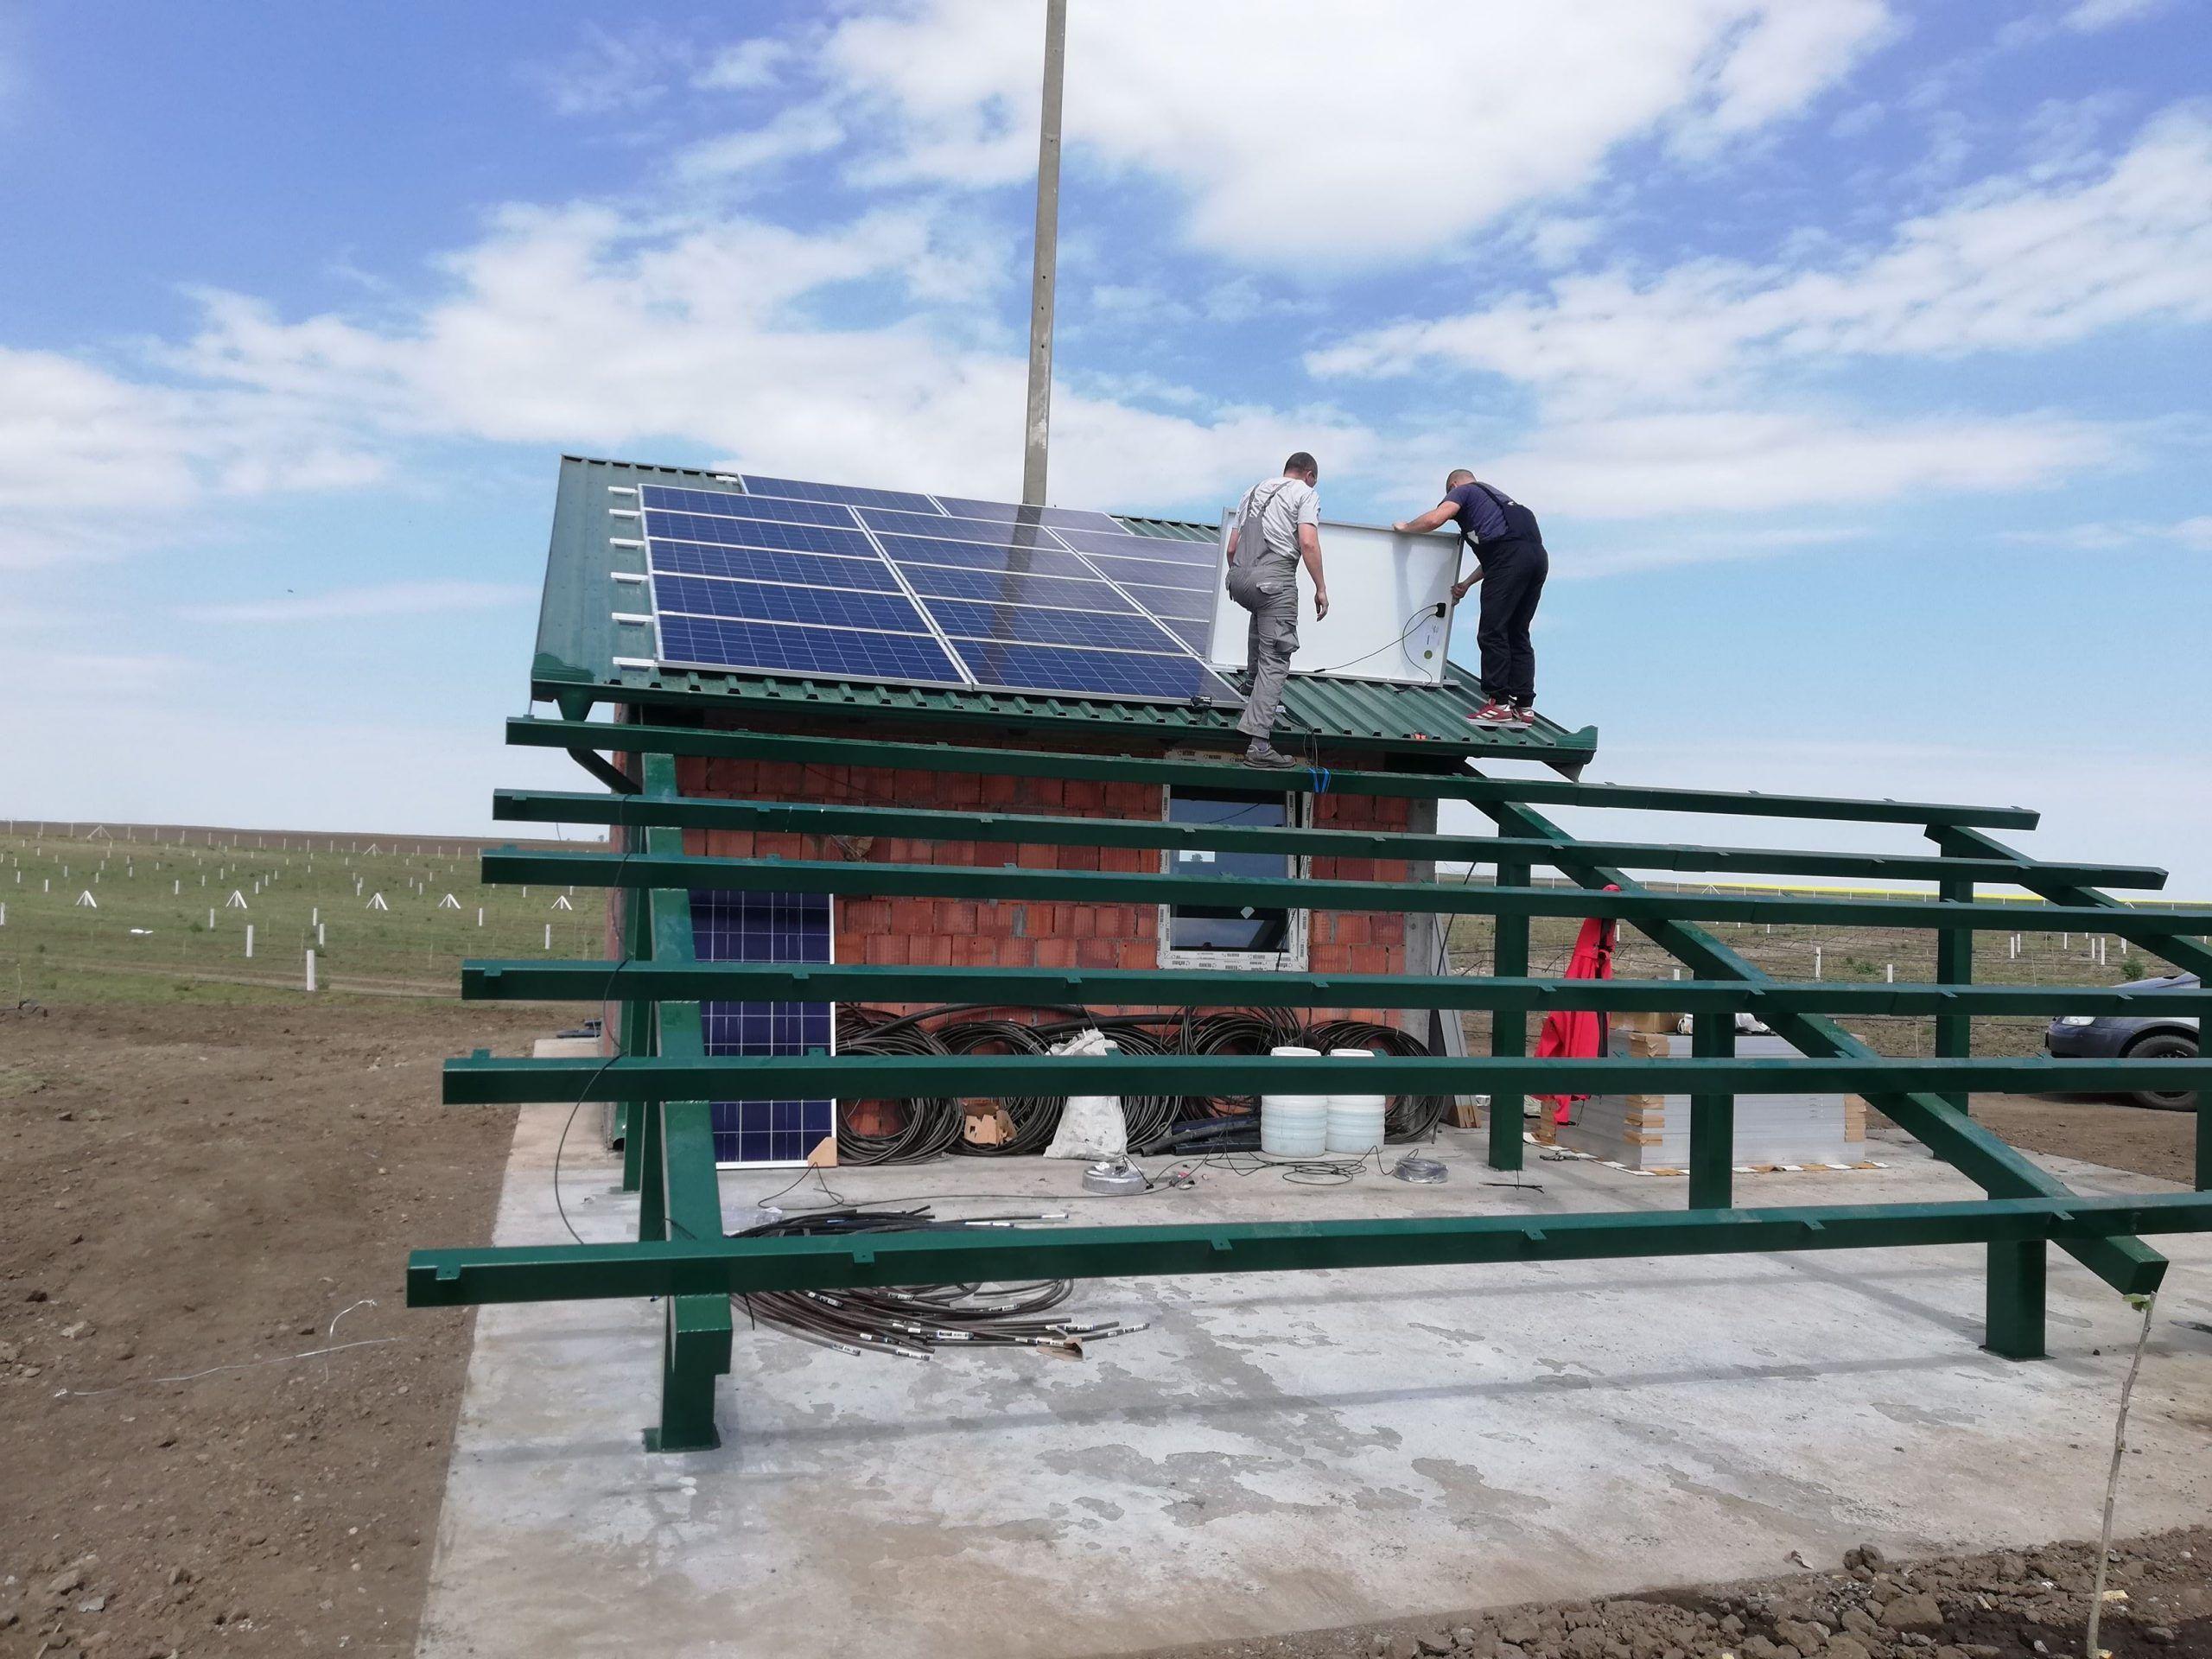 Montiranje solarniz panela za navodnjavanje